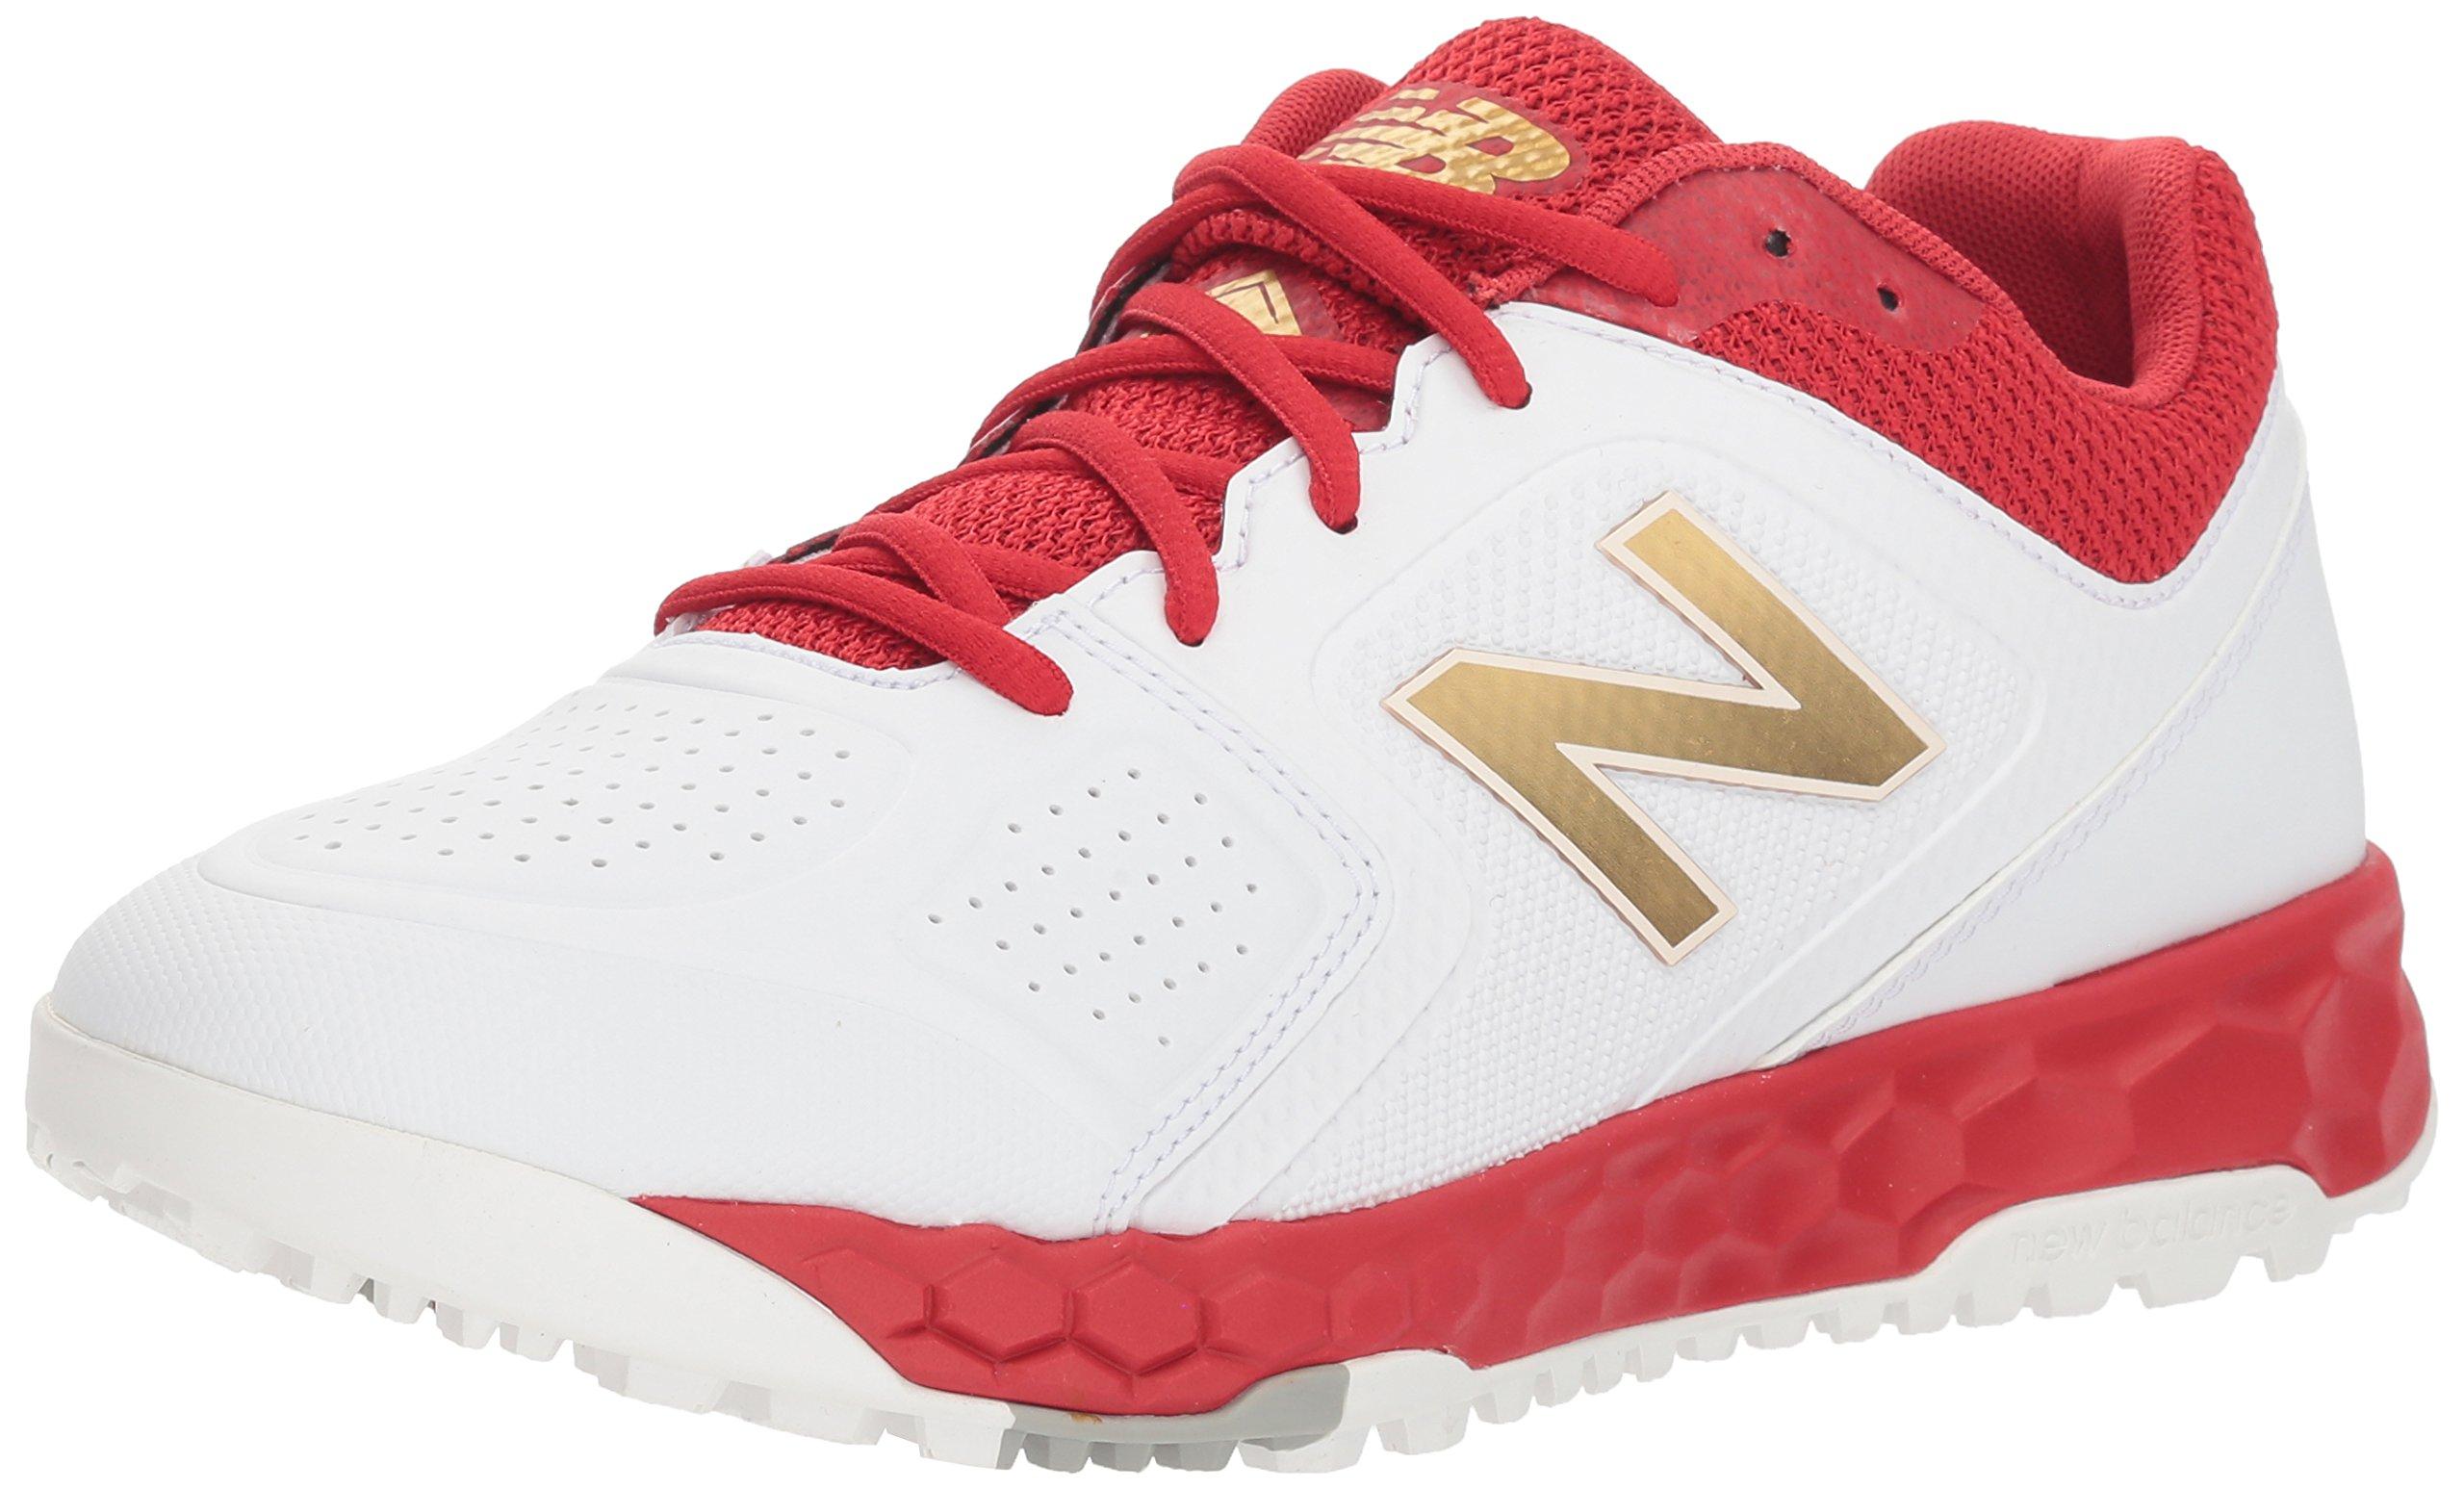 New Balance Women's Velo V1 Turf Softball Shoe